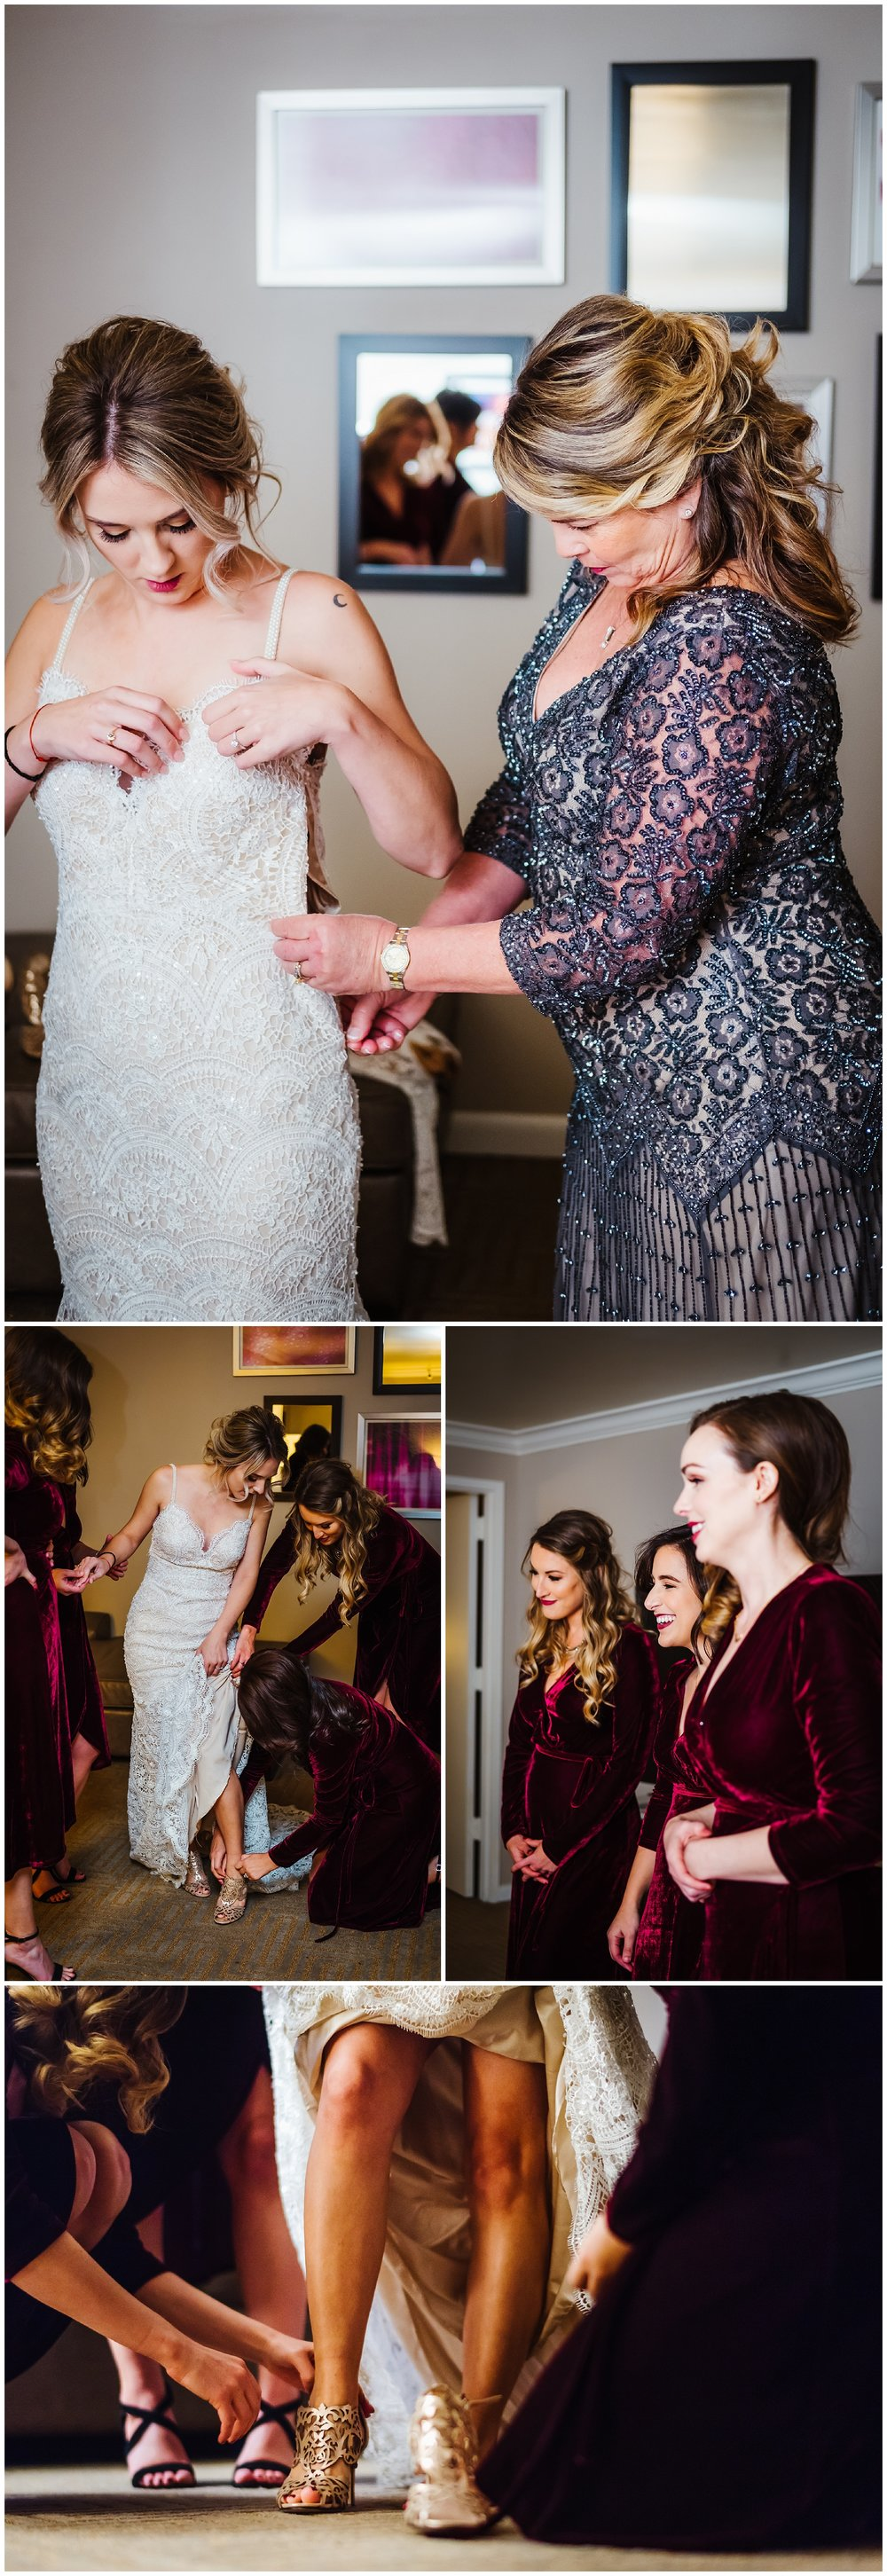 tampa-armeture-wedding-photographer-edgy-industrial-downtown-fancy-free-nursery-tattoo-burgandy-velvet_0010.jpg